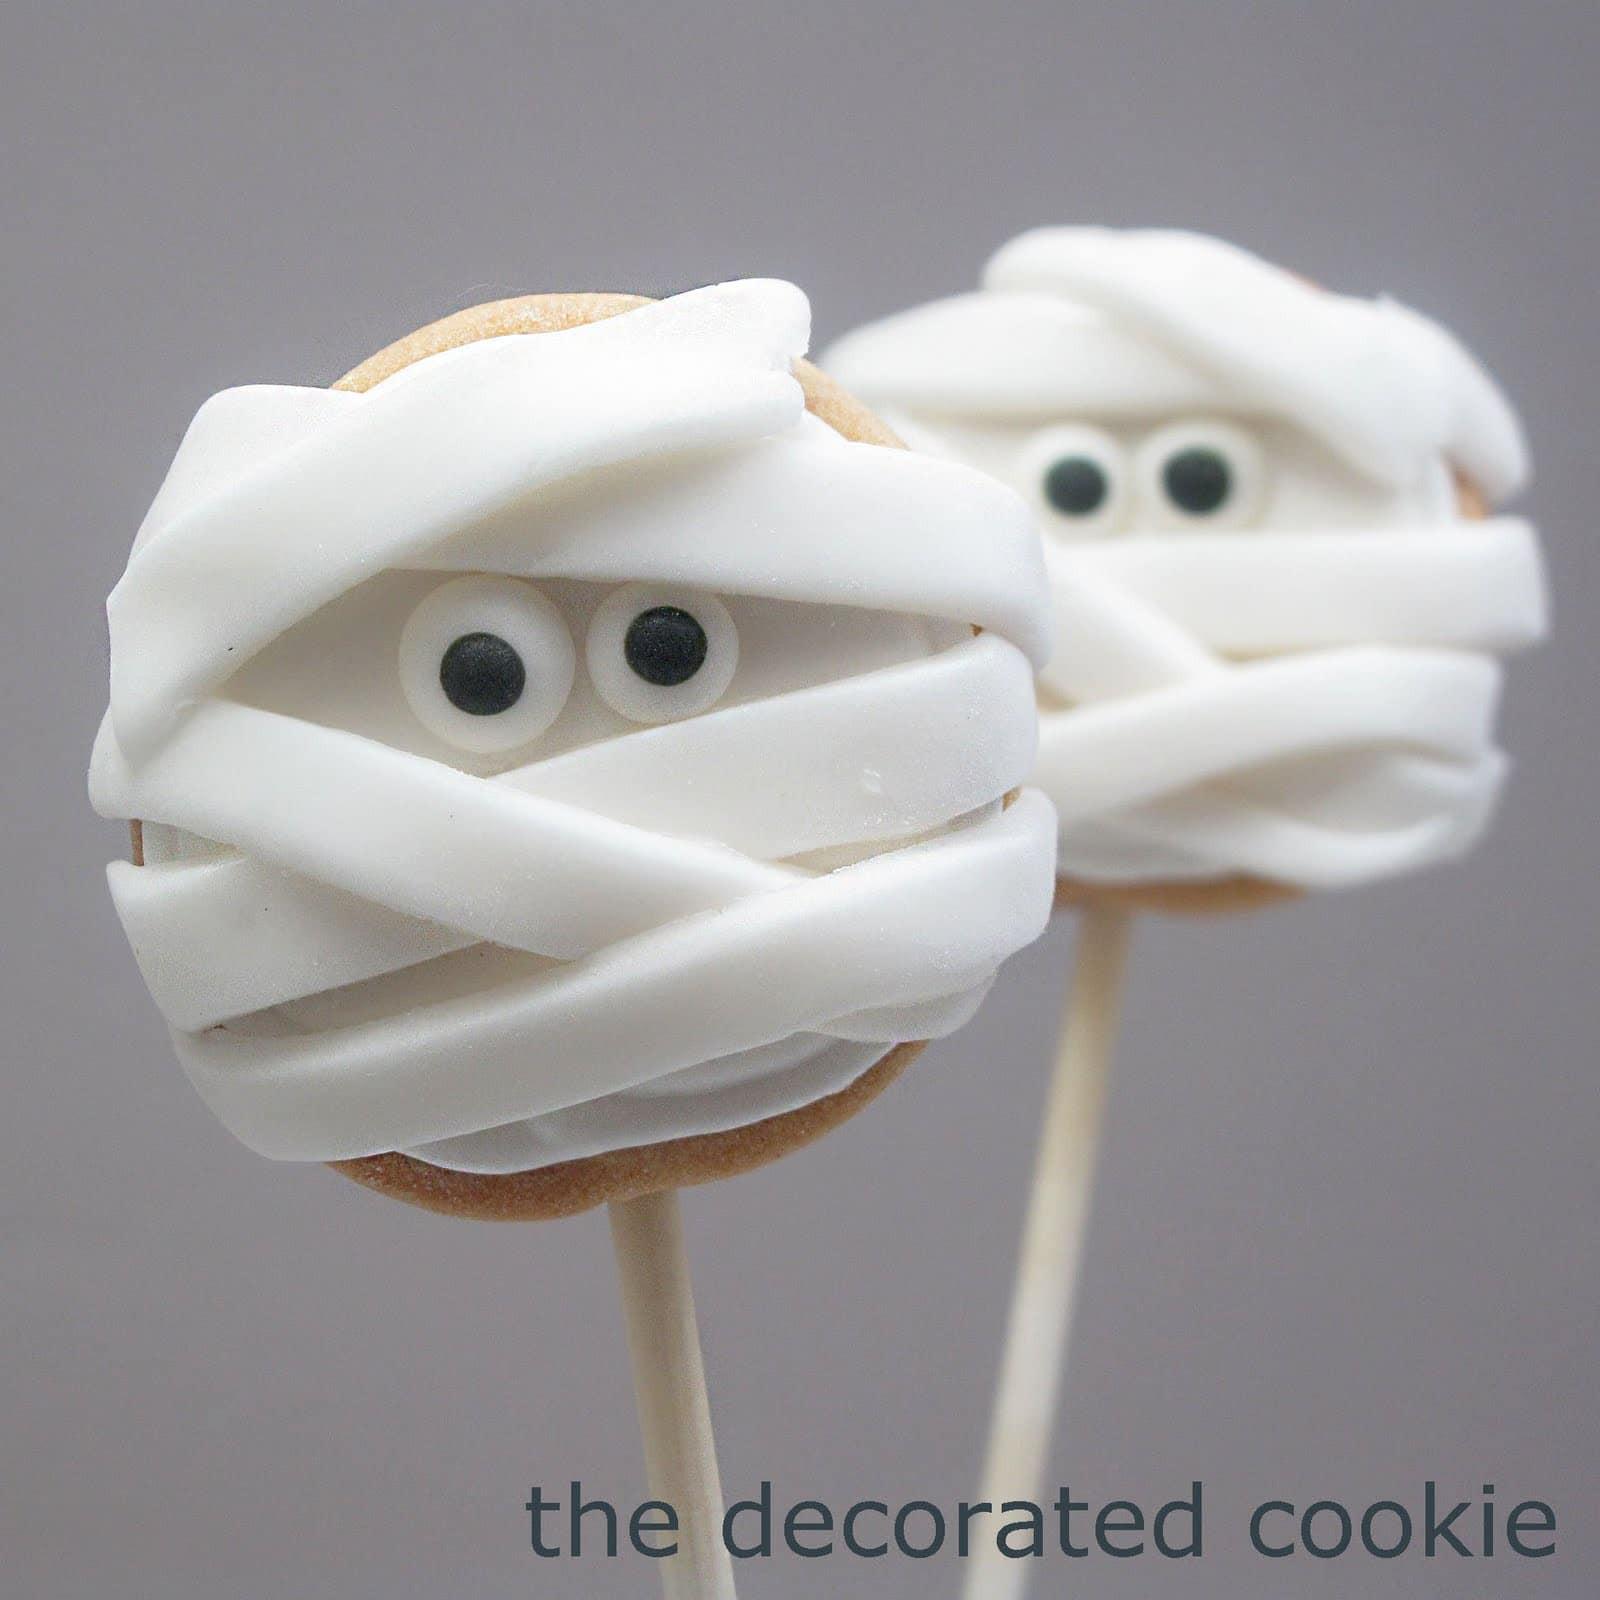 Mummy Cookies For Halloween  Halloween mummy cookie pops fun food for Halloween